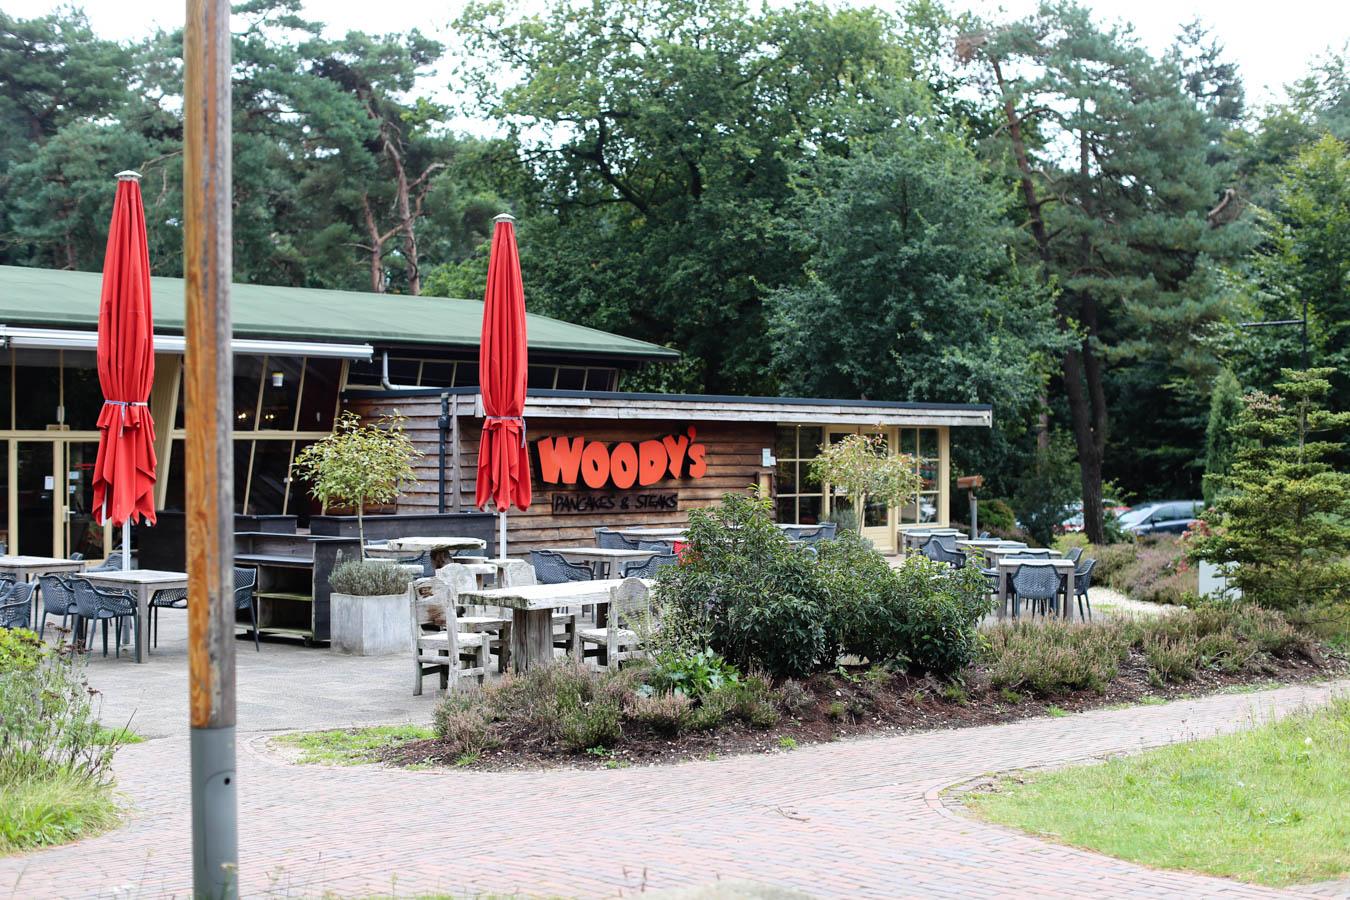 Restaurant Woody's